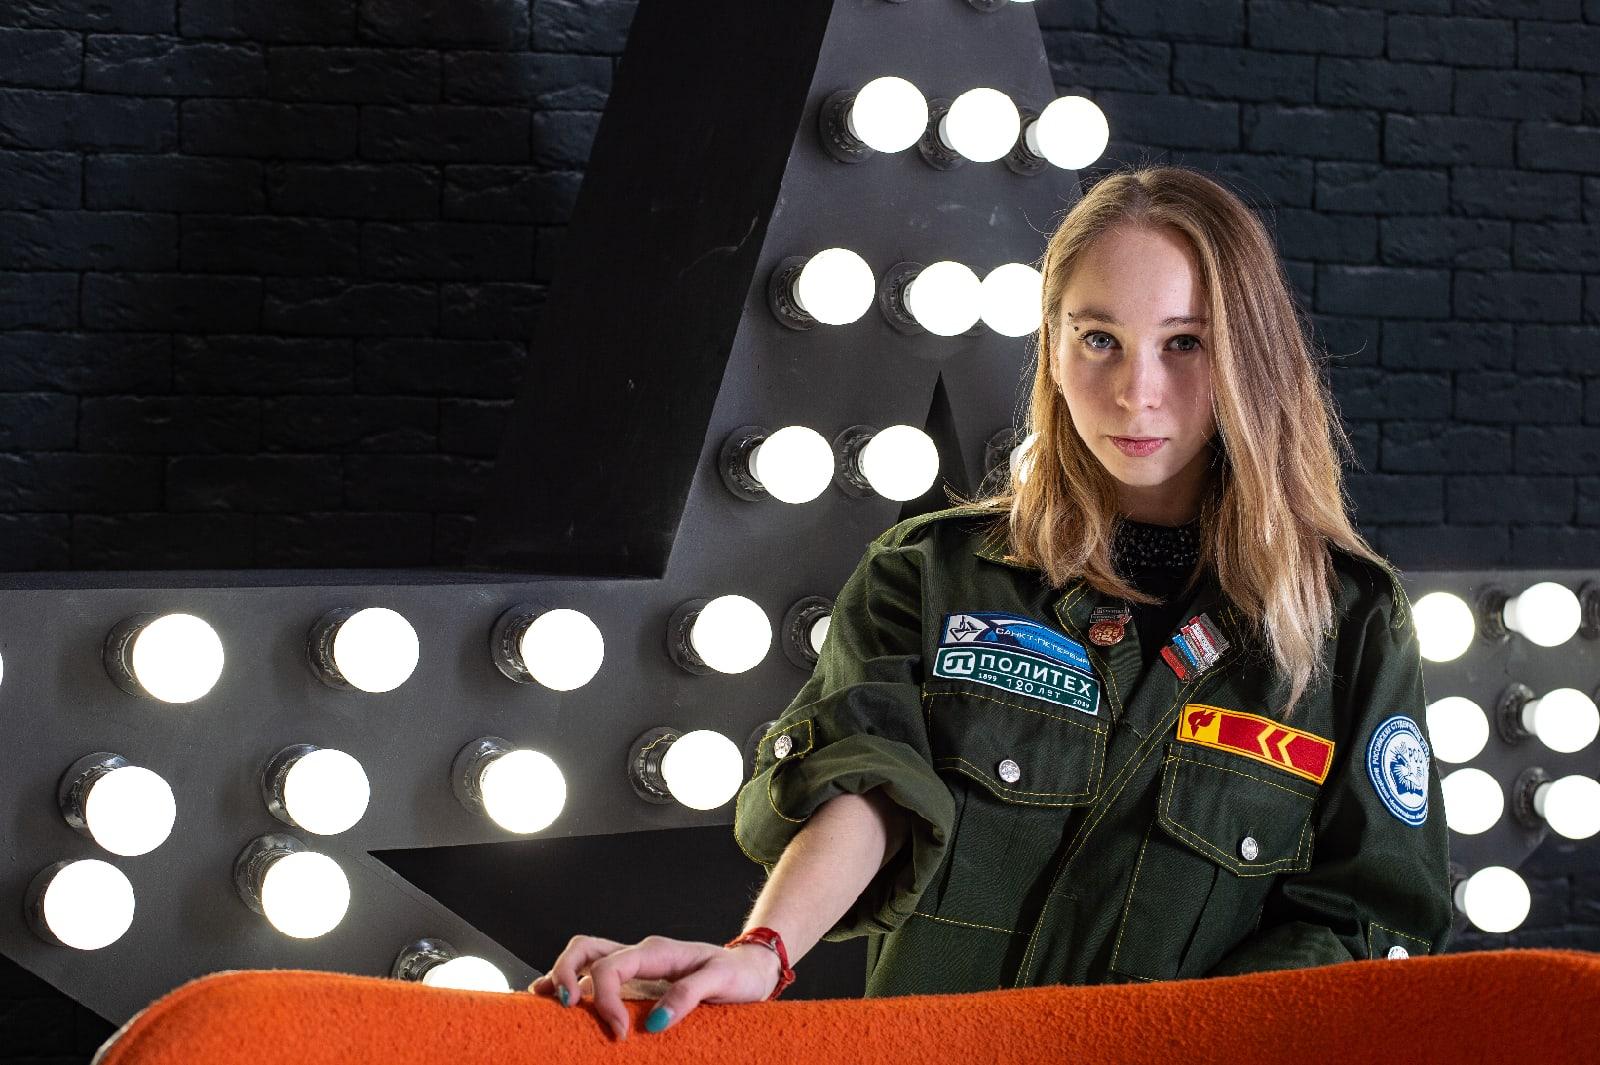 Анастасия Брекоткина: Я люблю отряды за атмосферу